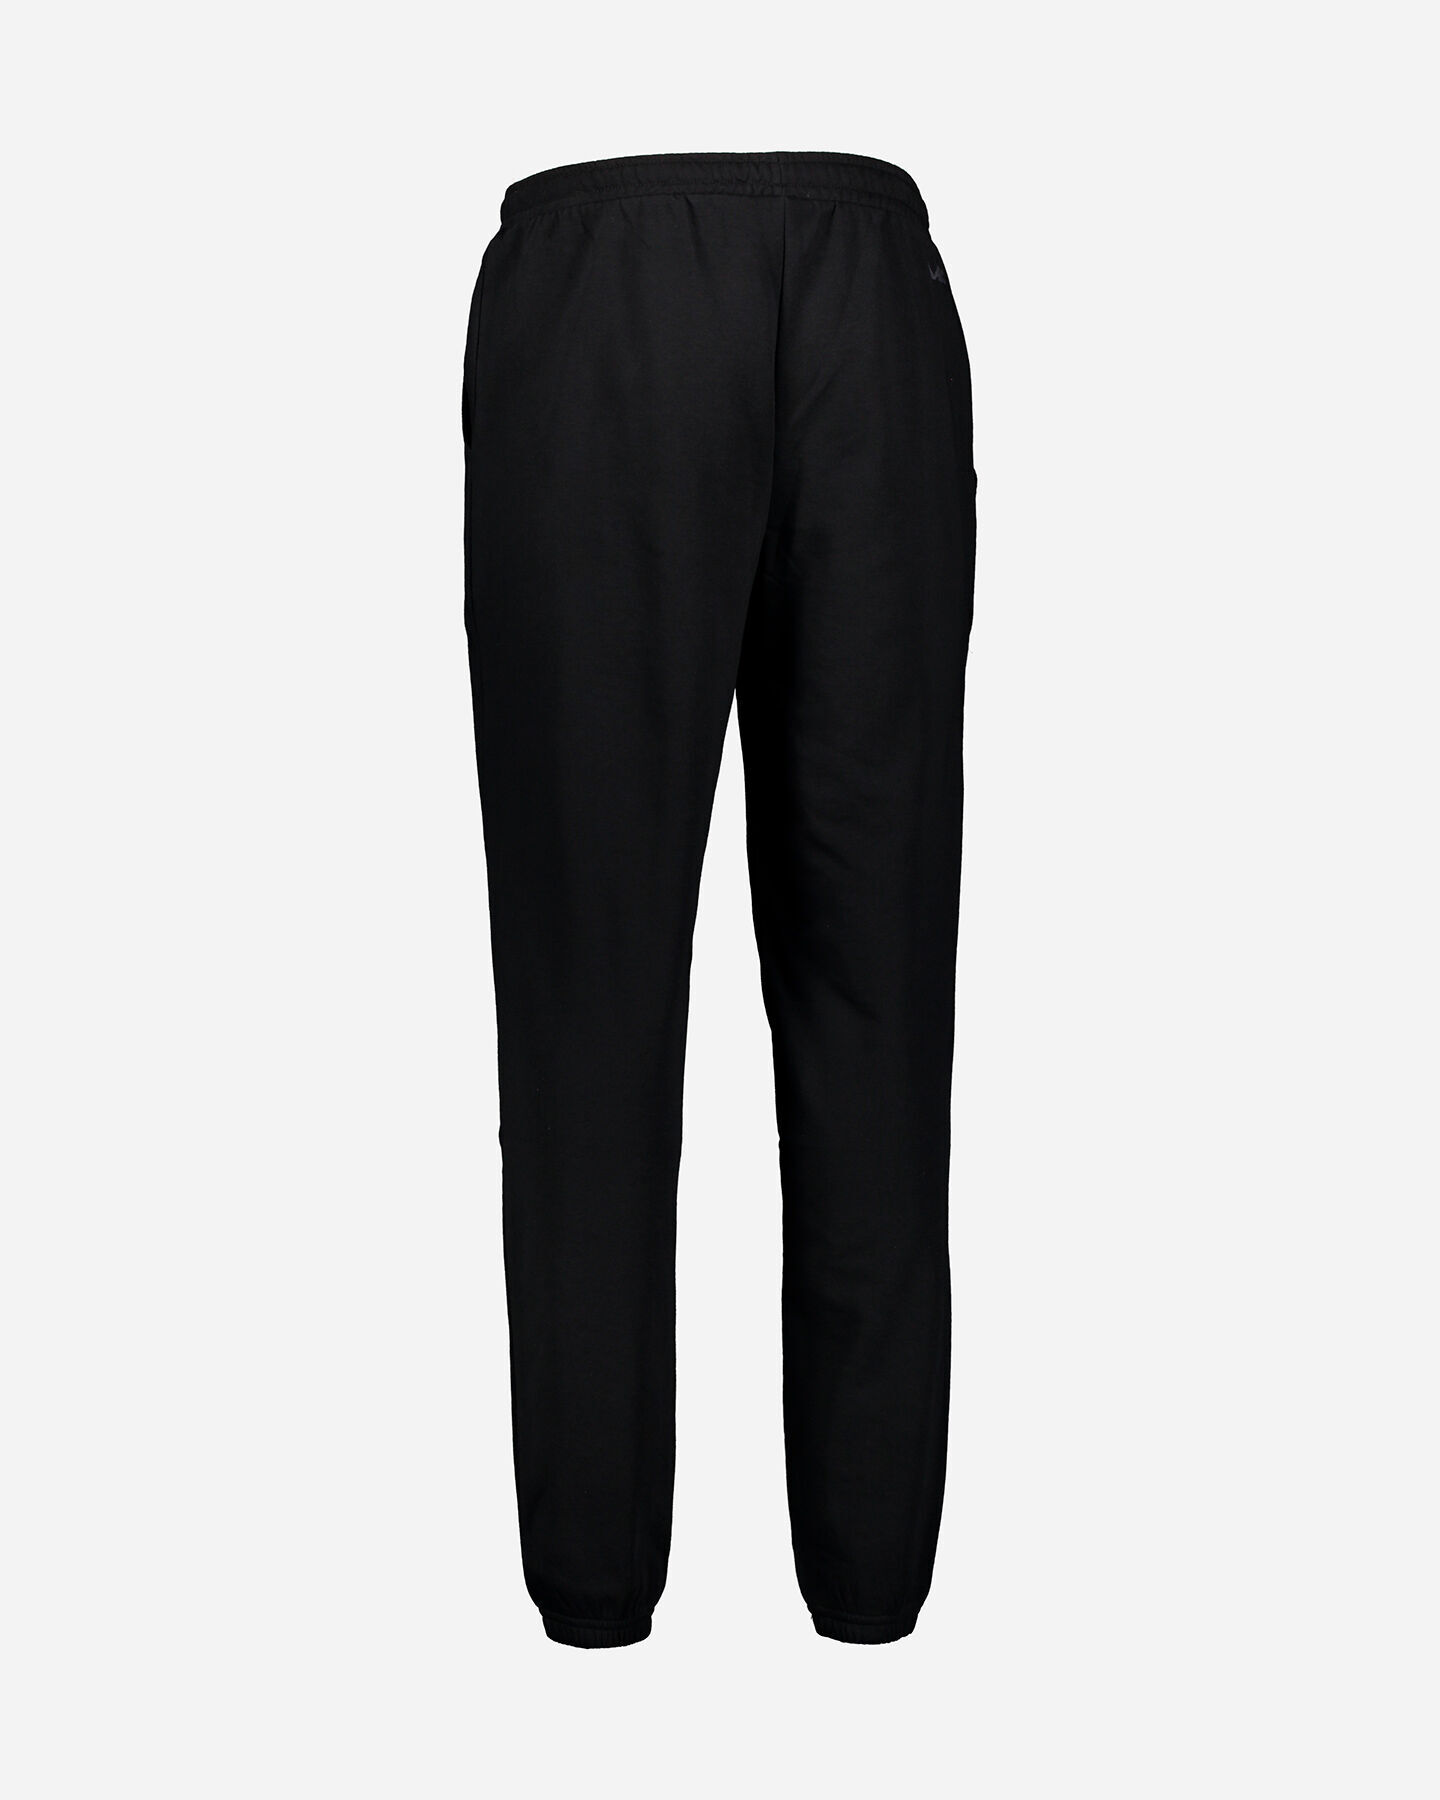 Pantalone ABC ELASTIC HEM M S5296312 scatto 5